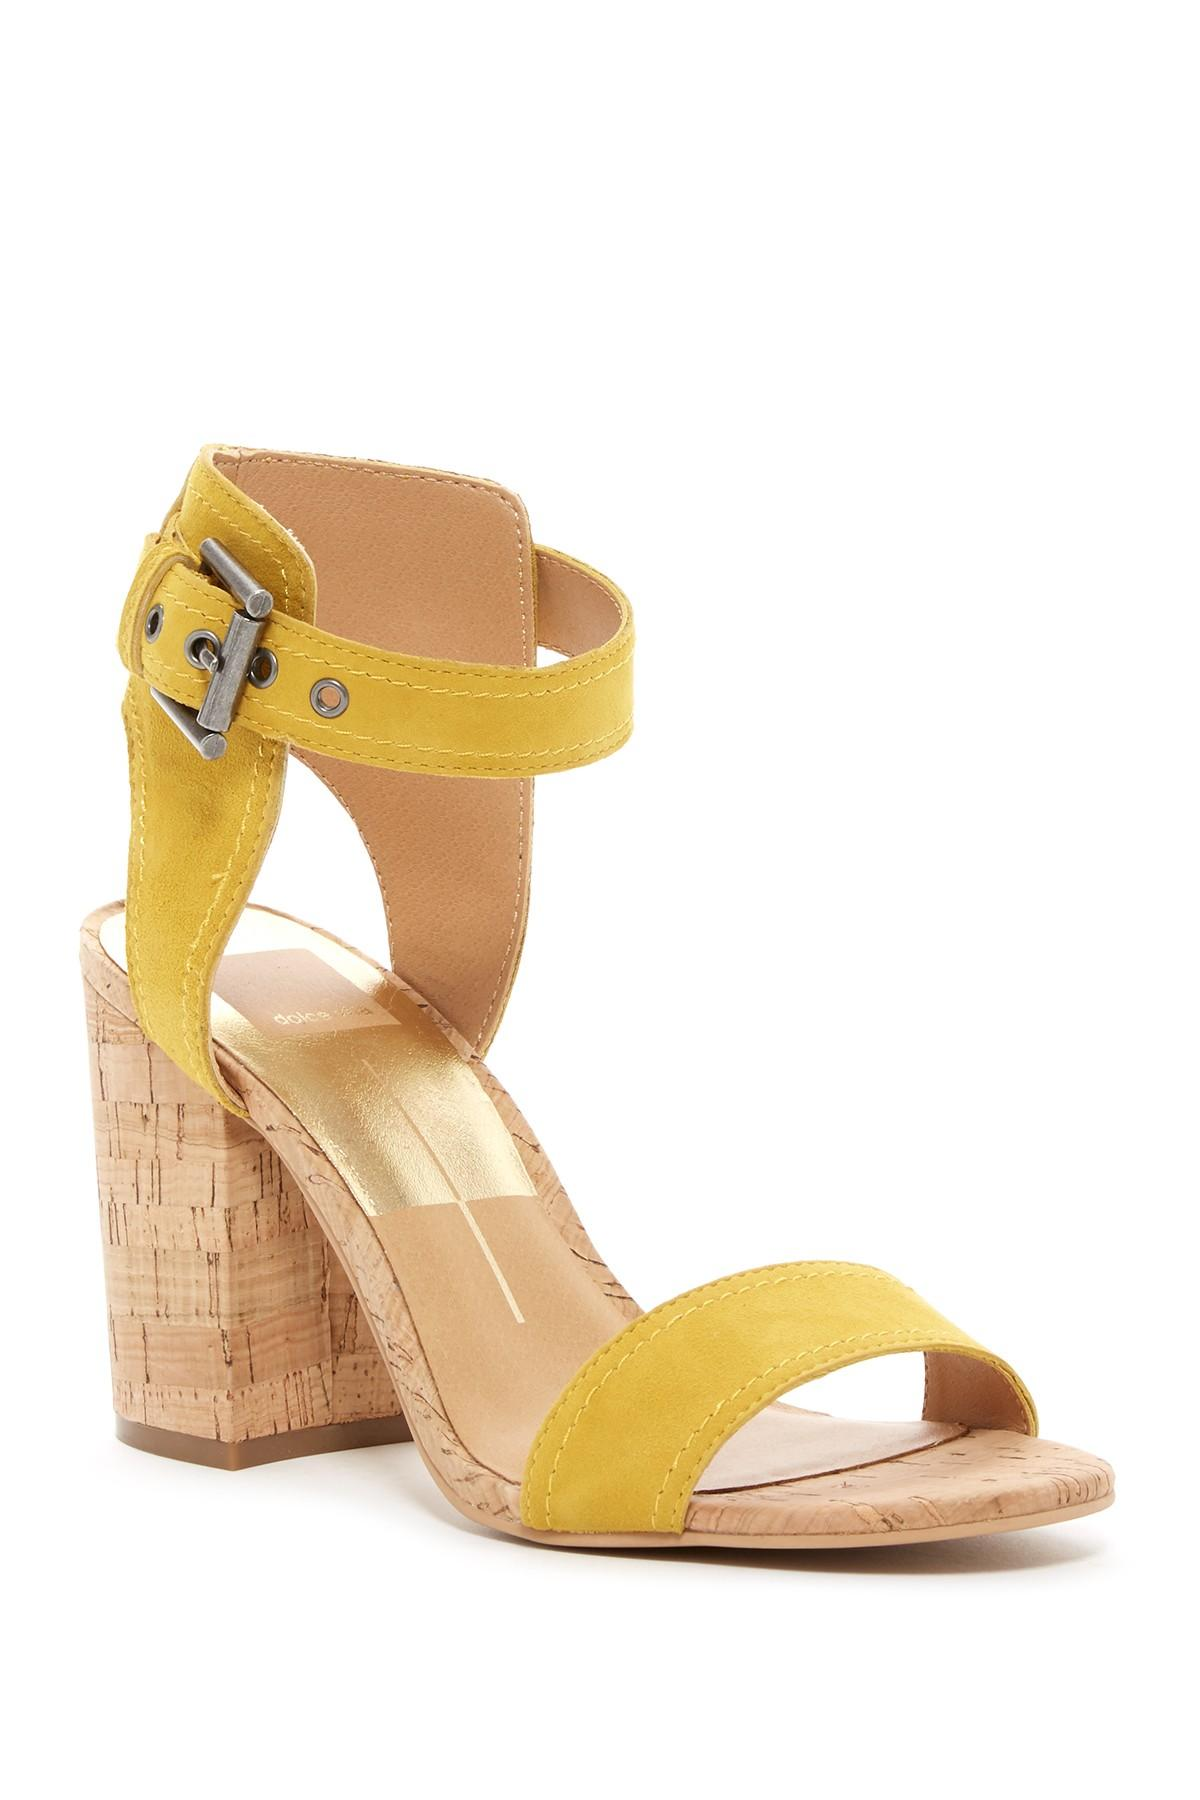 3d4fbbd74ee Lyst - Dolce Vita Cally Block Heel Sandal in Yellow